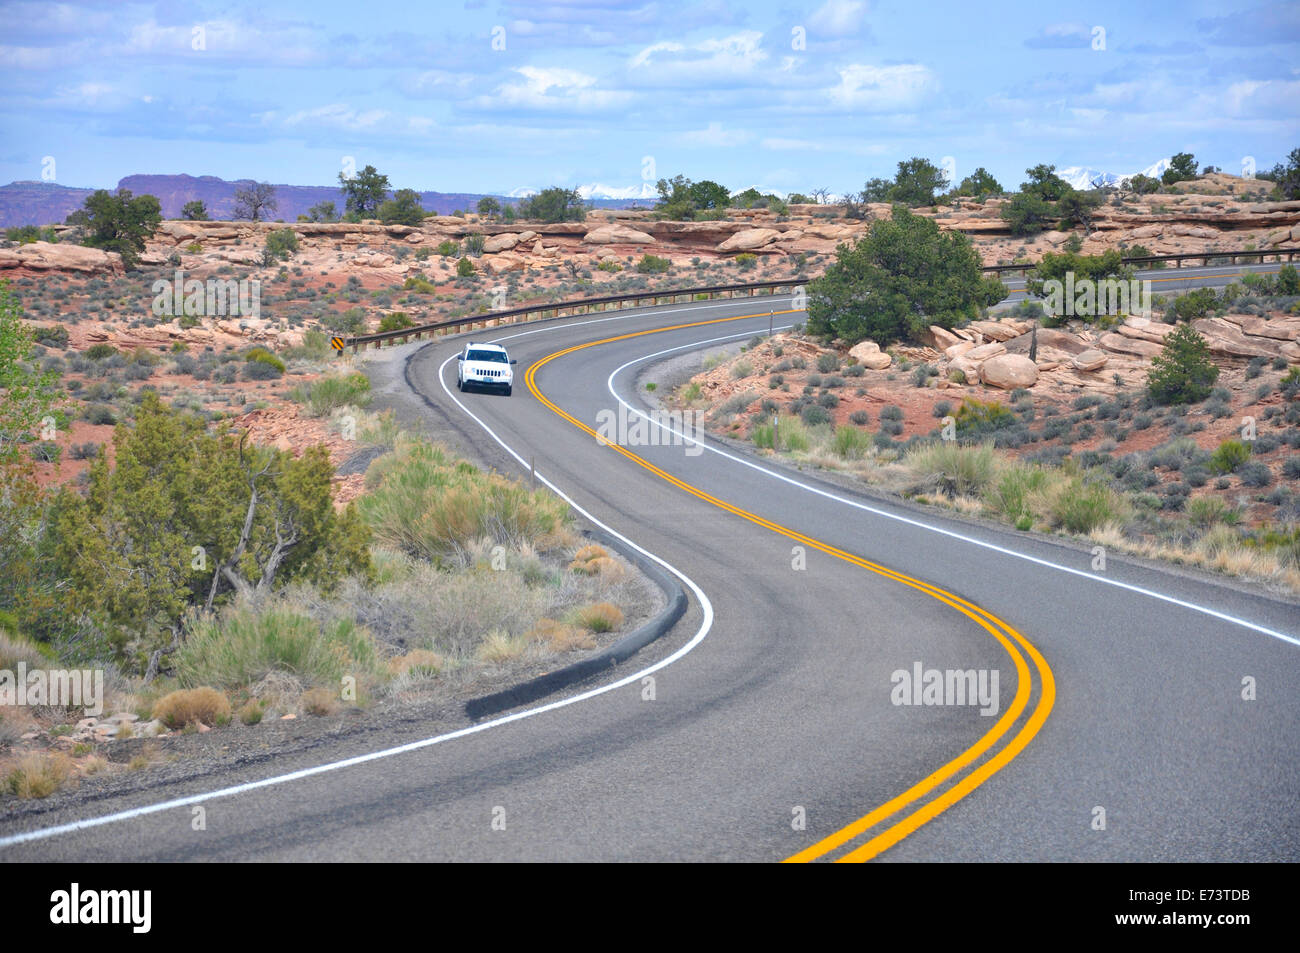 Canyonland National Park, Utah, USA - Stock Image